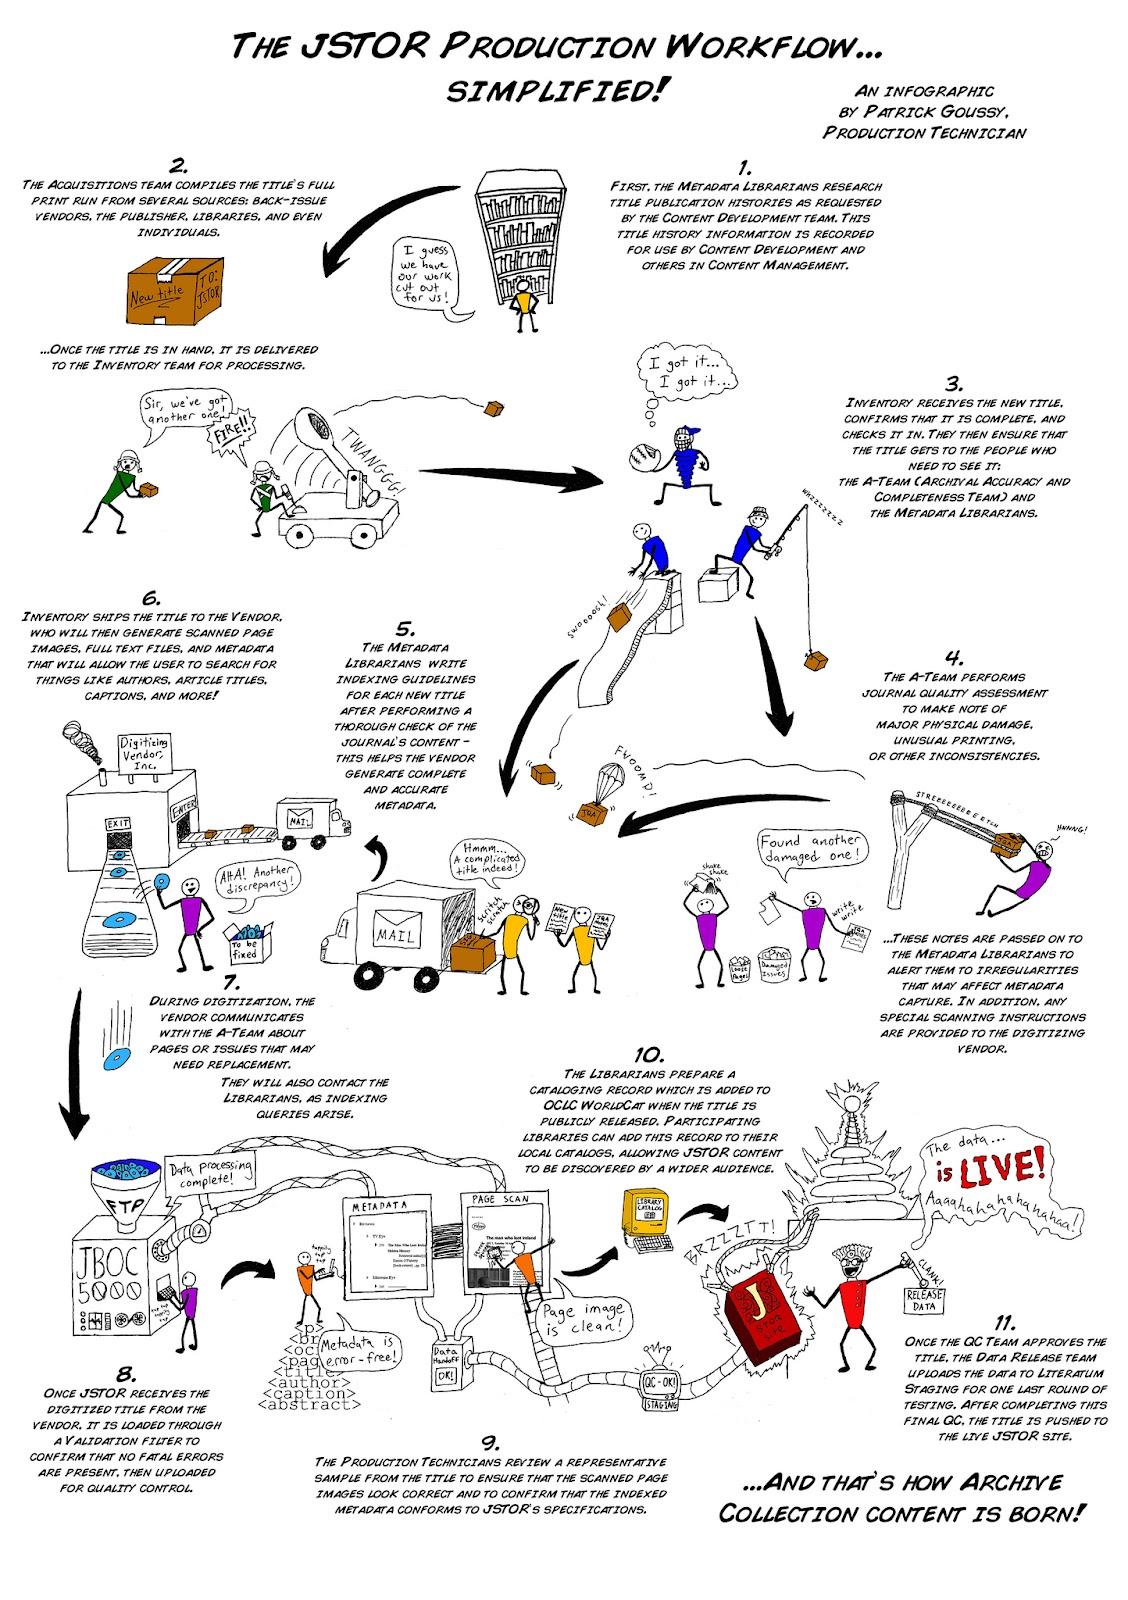 Christ University Library Jstor Production Workflow